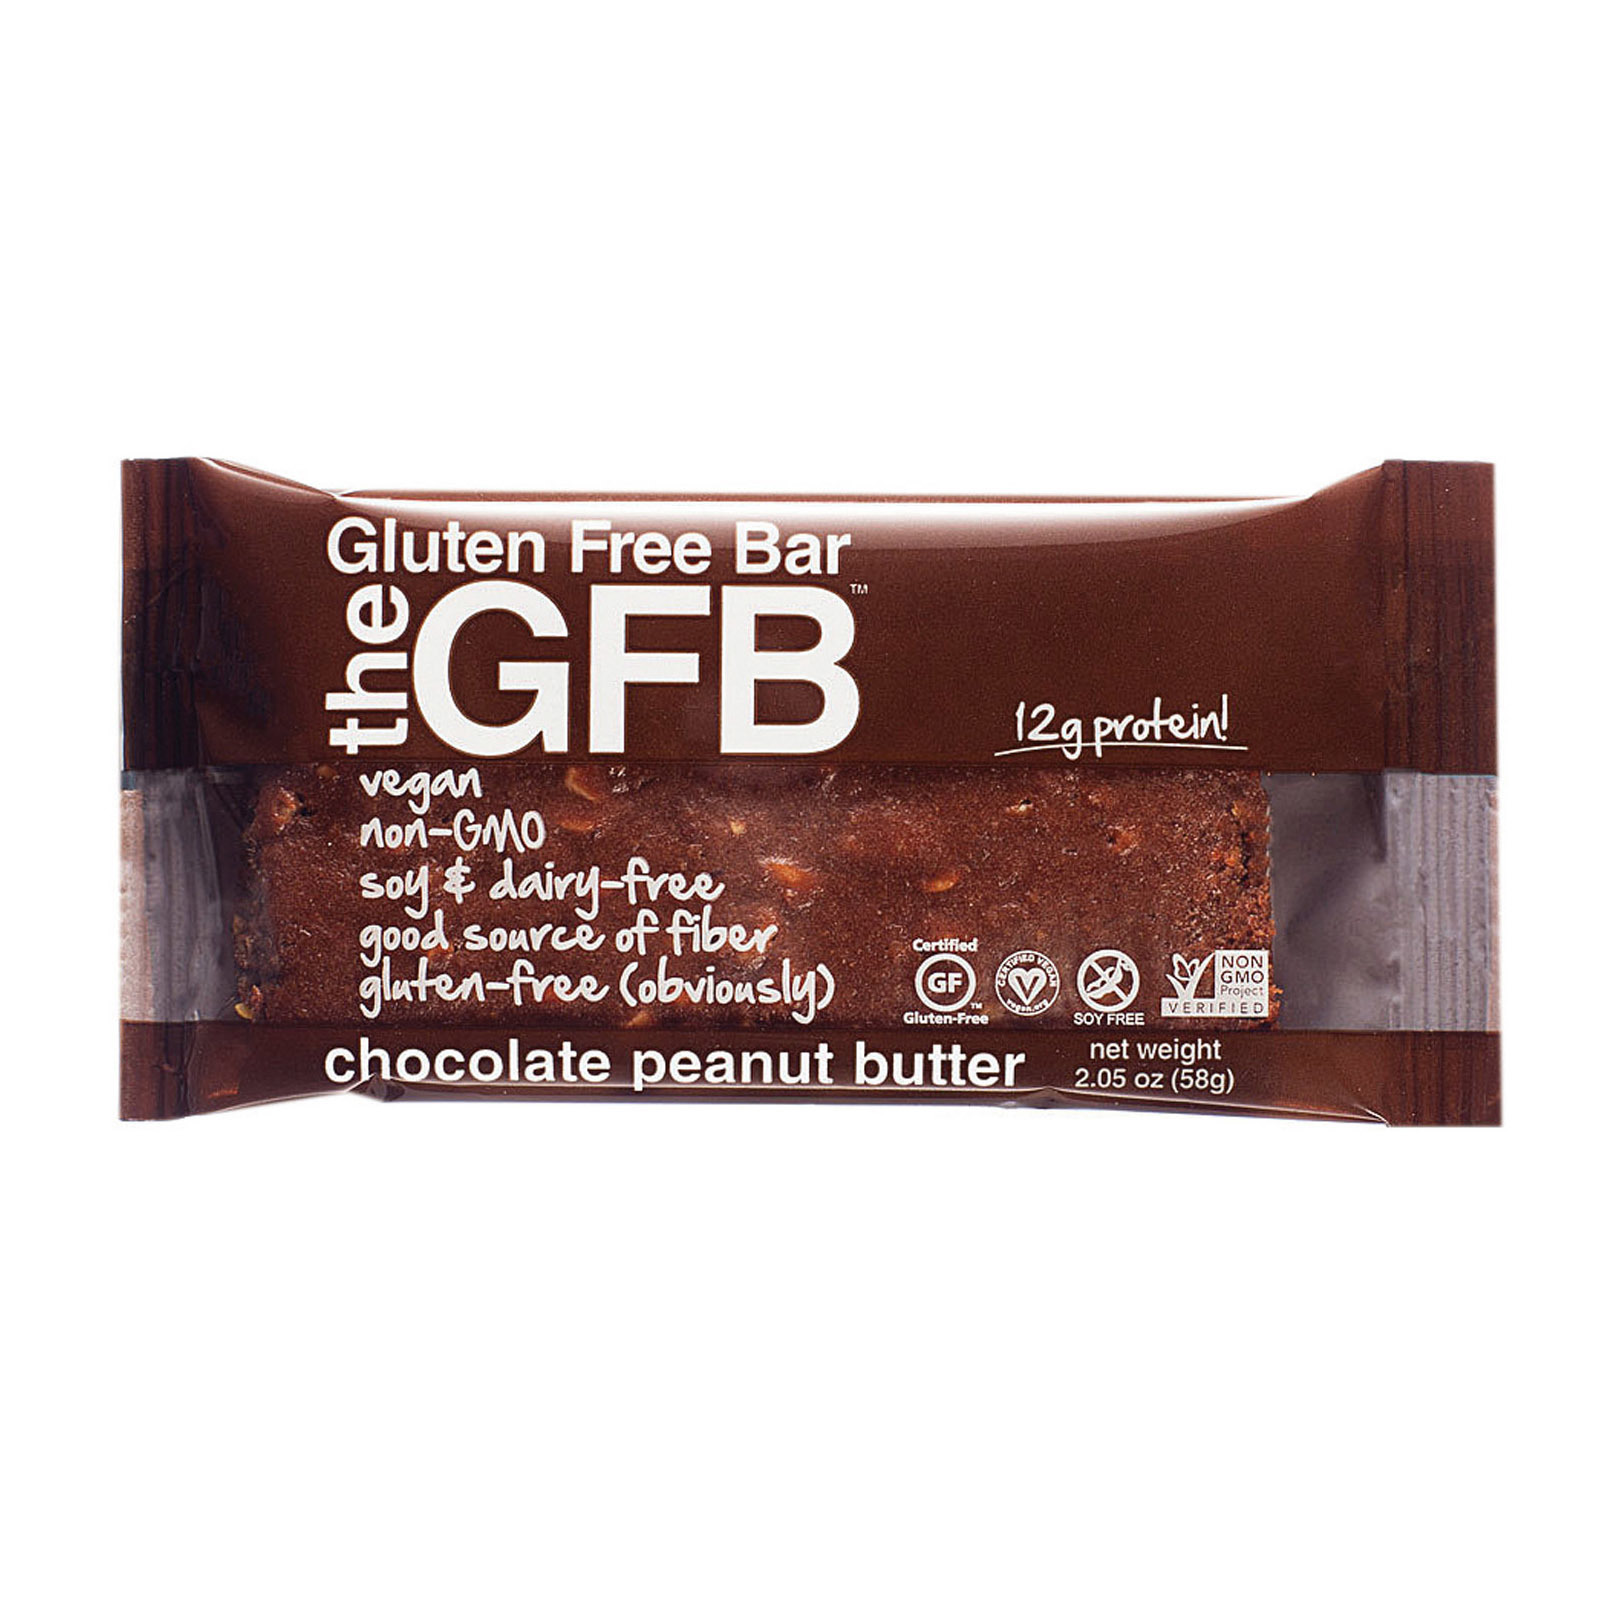 The Gluten Freeb Bar - Chocolate Peanut Butter - Gluten Free - Case of 12 - 2.05 oz